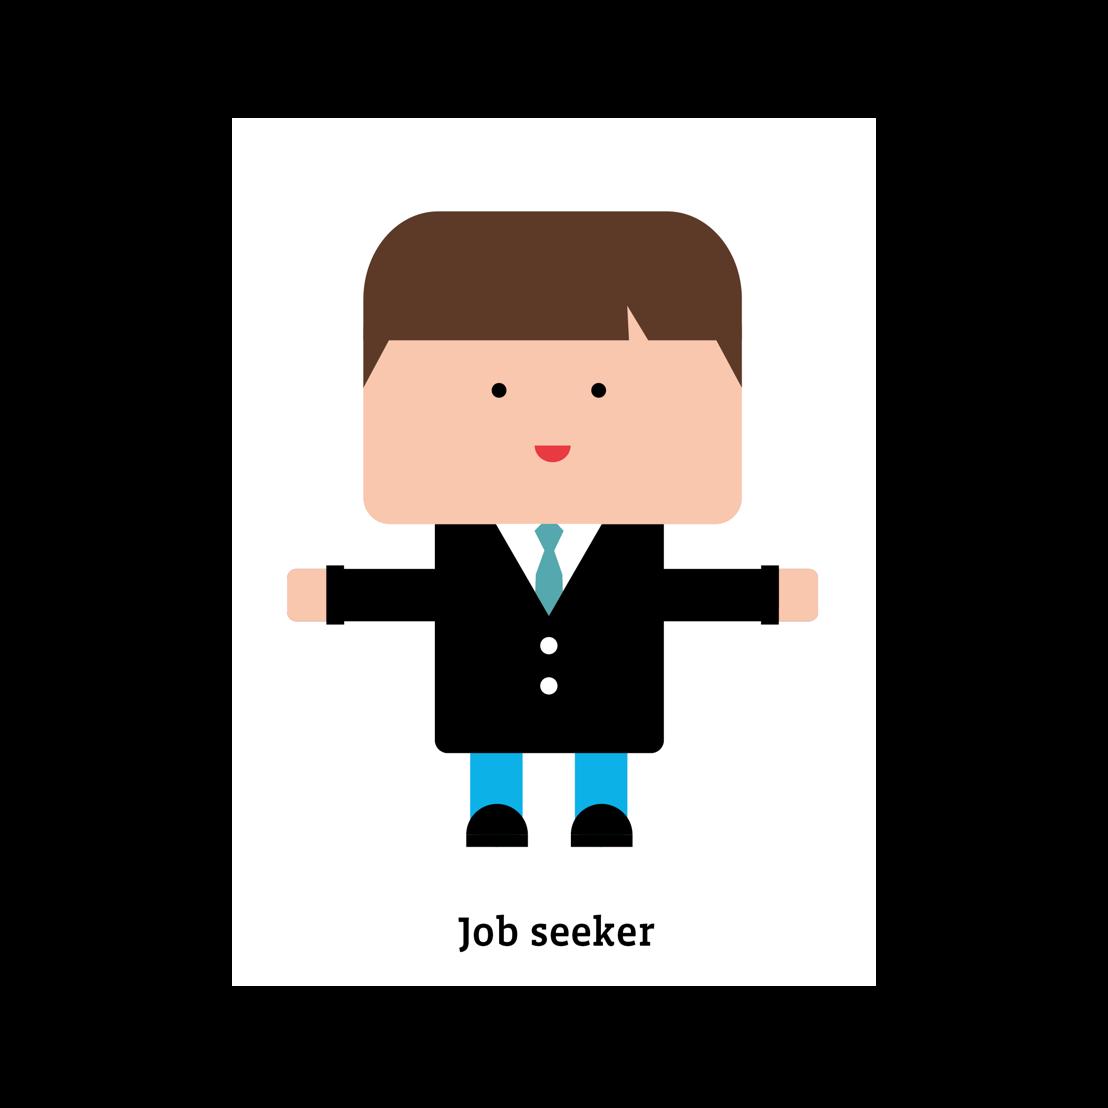 Who's IZI? - Job seeker